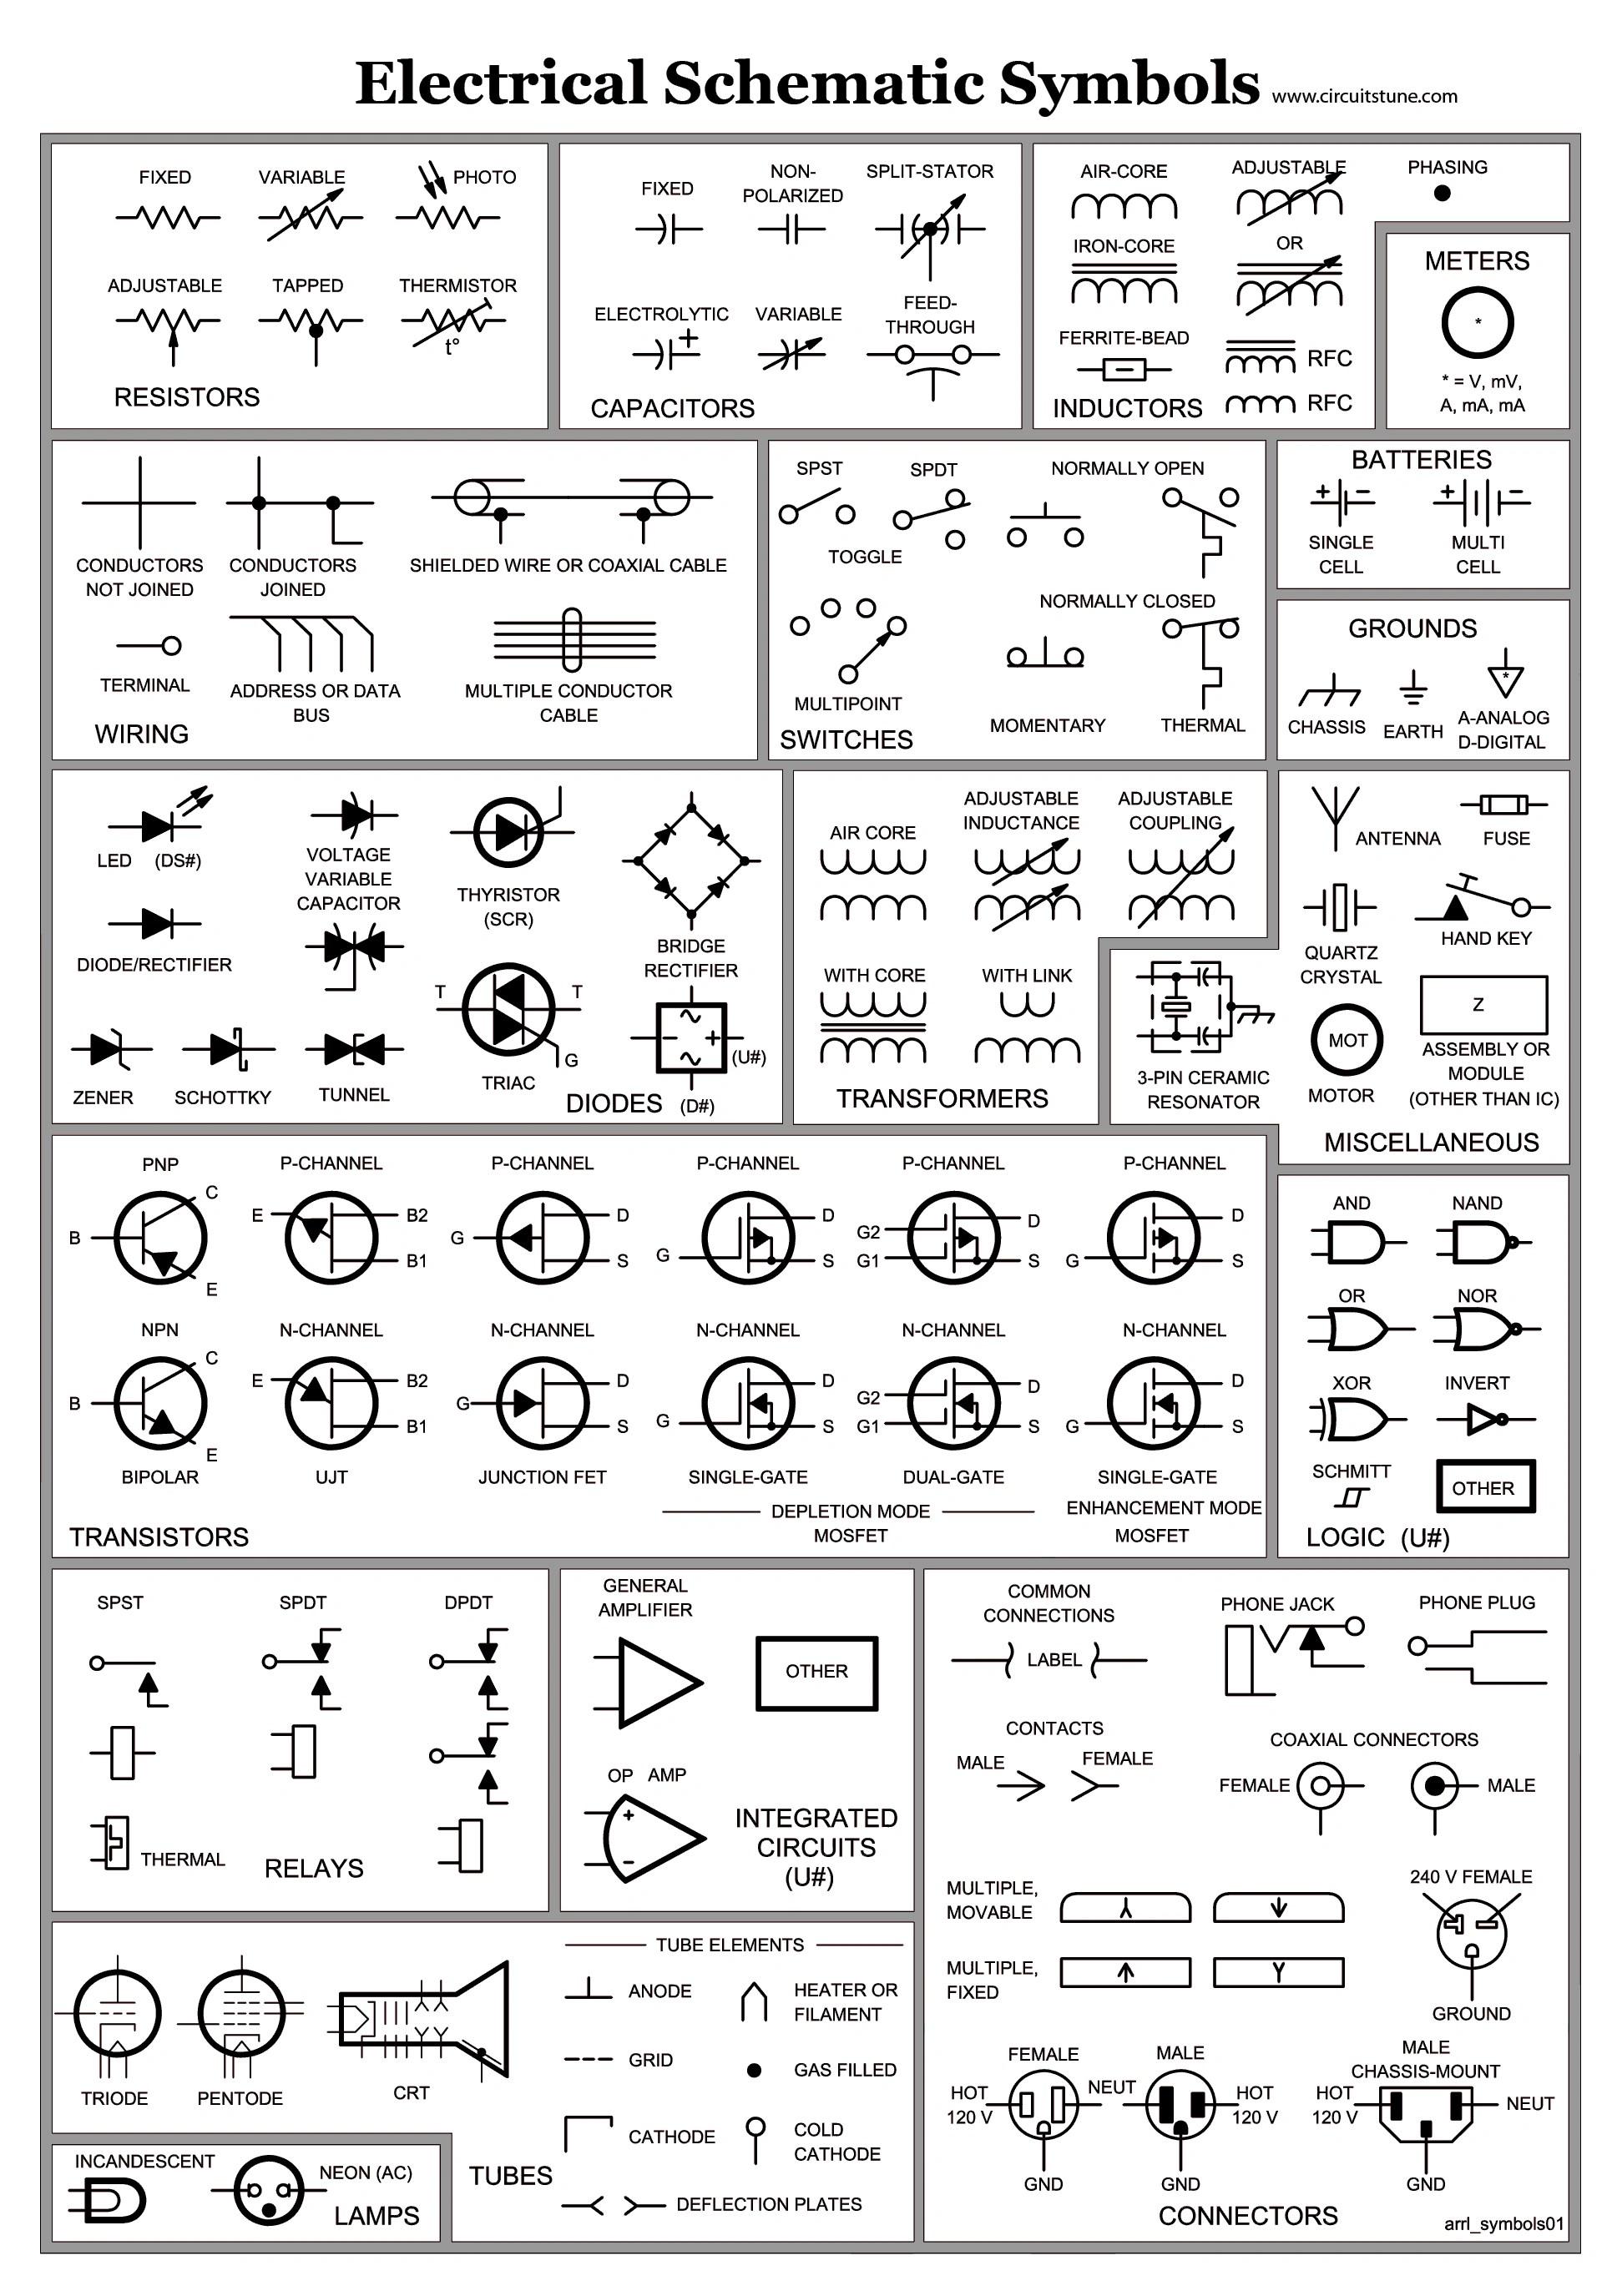 hvac electrical wiring symbol chartmedium resolution of circuit schematic symbols bmet wiki fandom powered by wikia home electrical wiring symbol